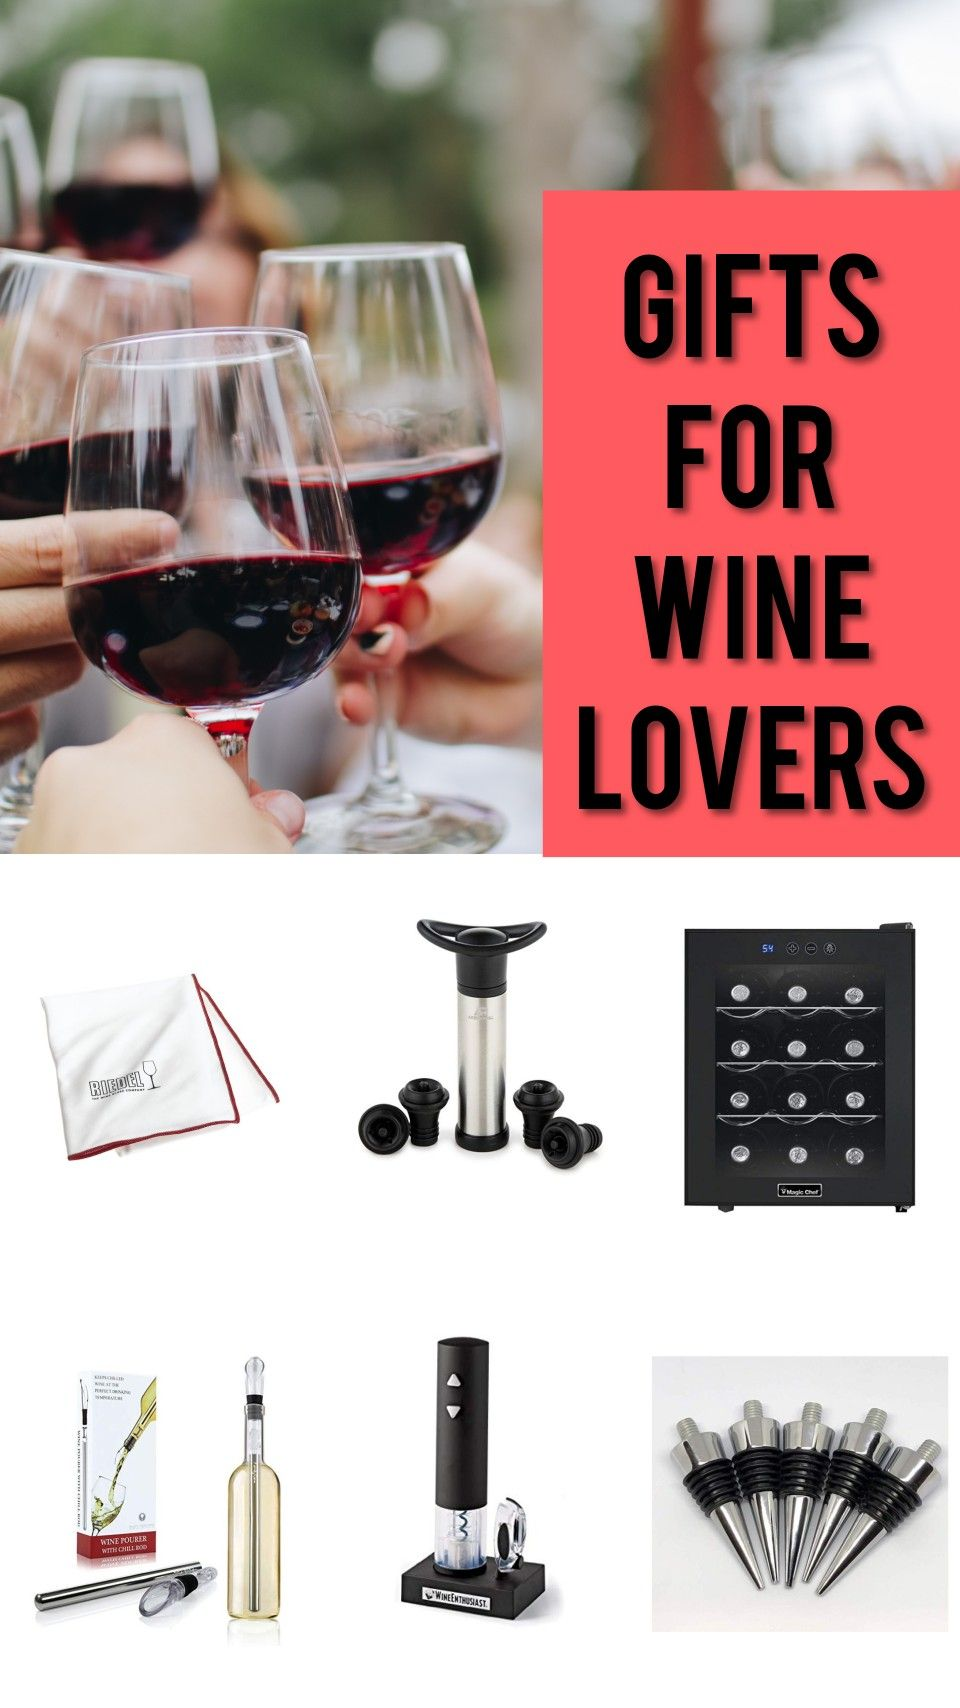 Gifts For Wine Lovers Gifts For Wine Lovers Wine Lovers Wine